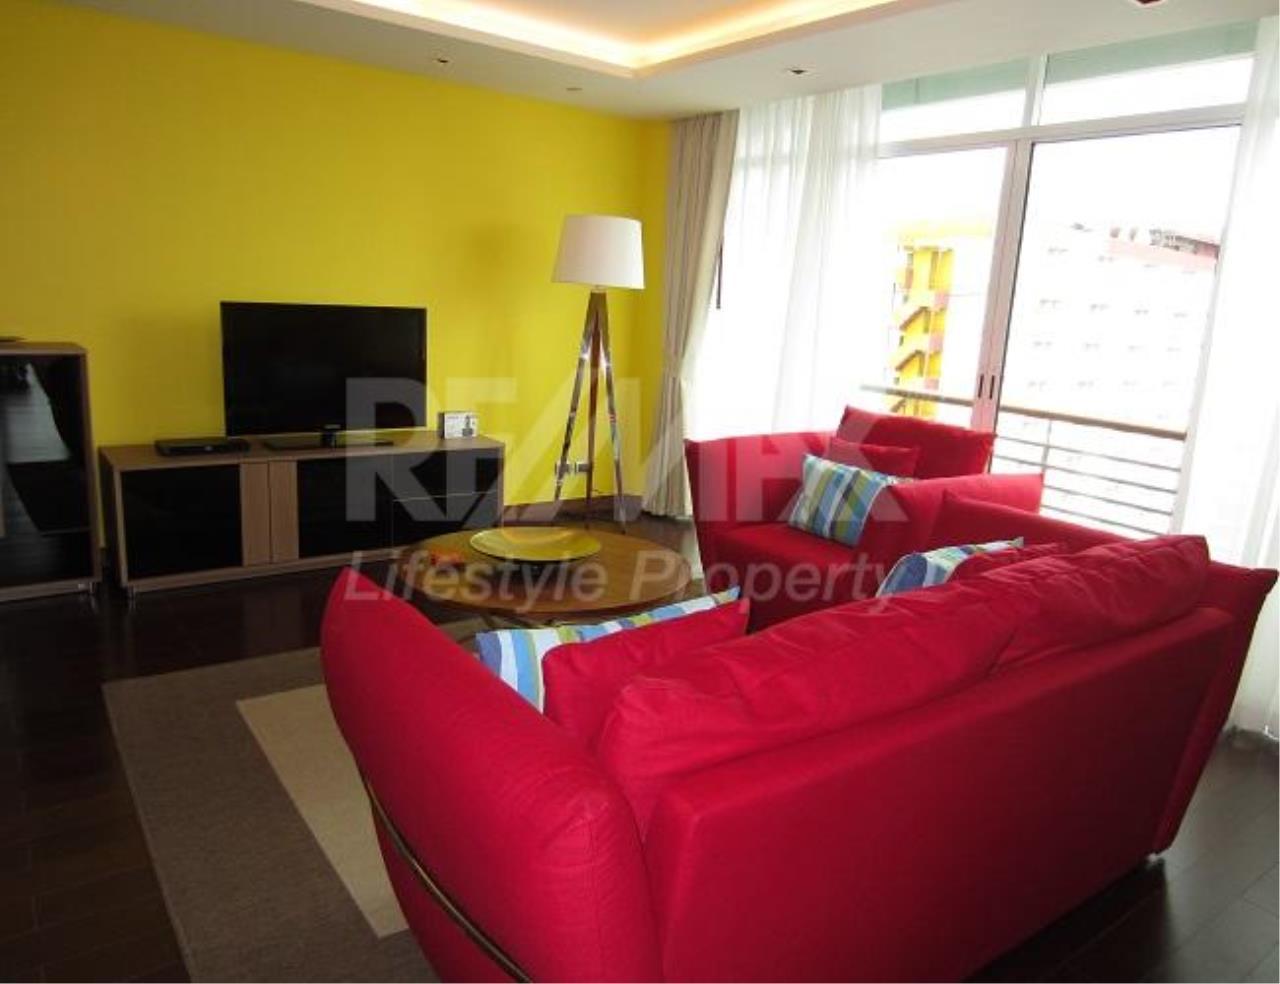 RE/MAX LifeStyle Property Agency's Le Monaco Residence Ari 5